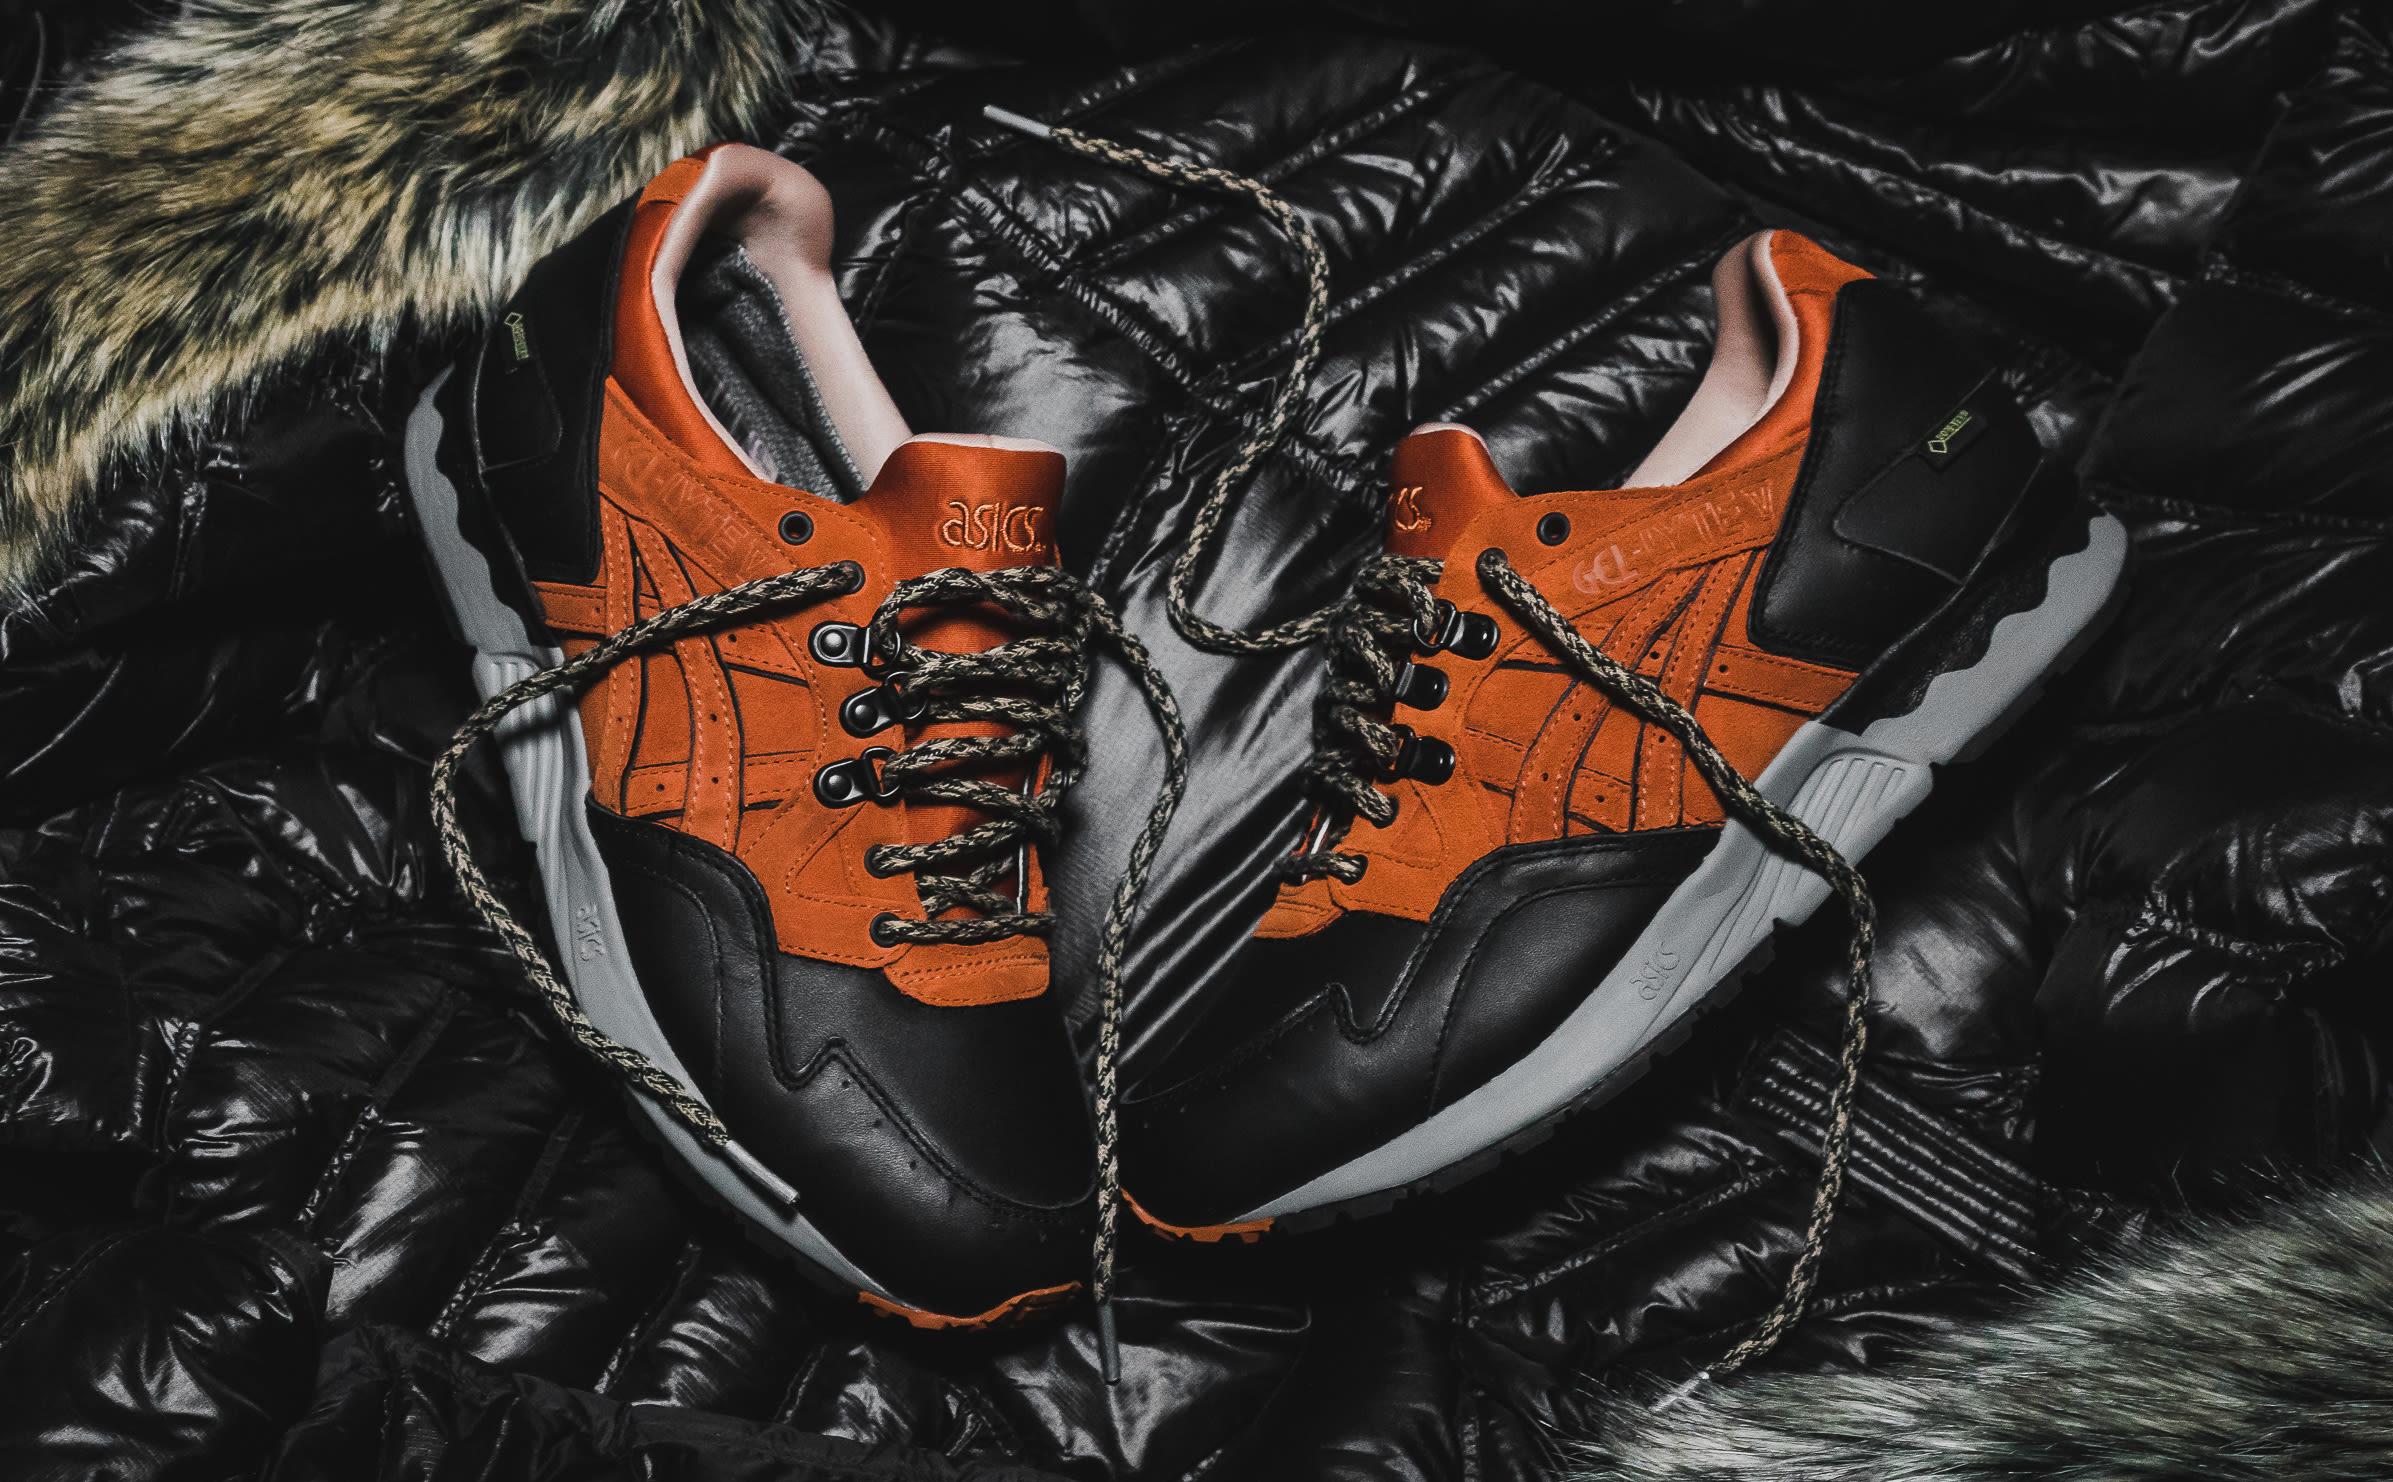 Seinfeld Asics Packer George Costanza Coat Sneakers Pair